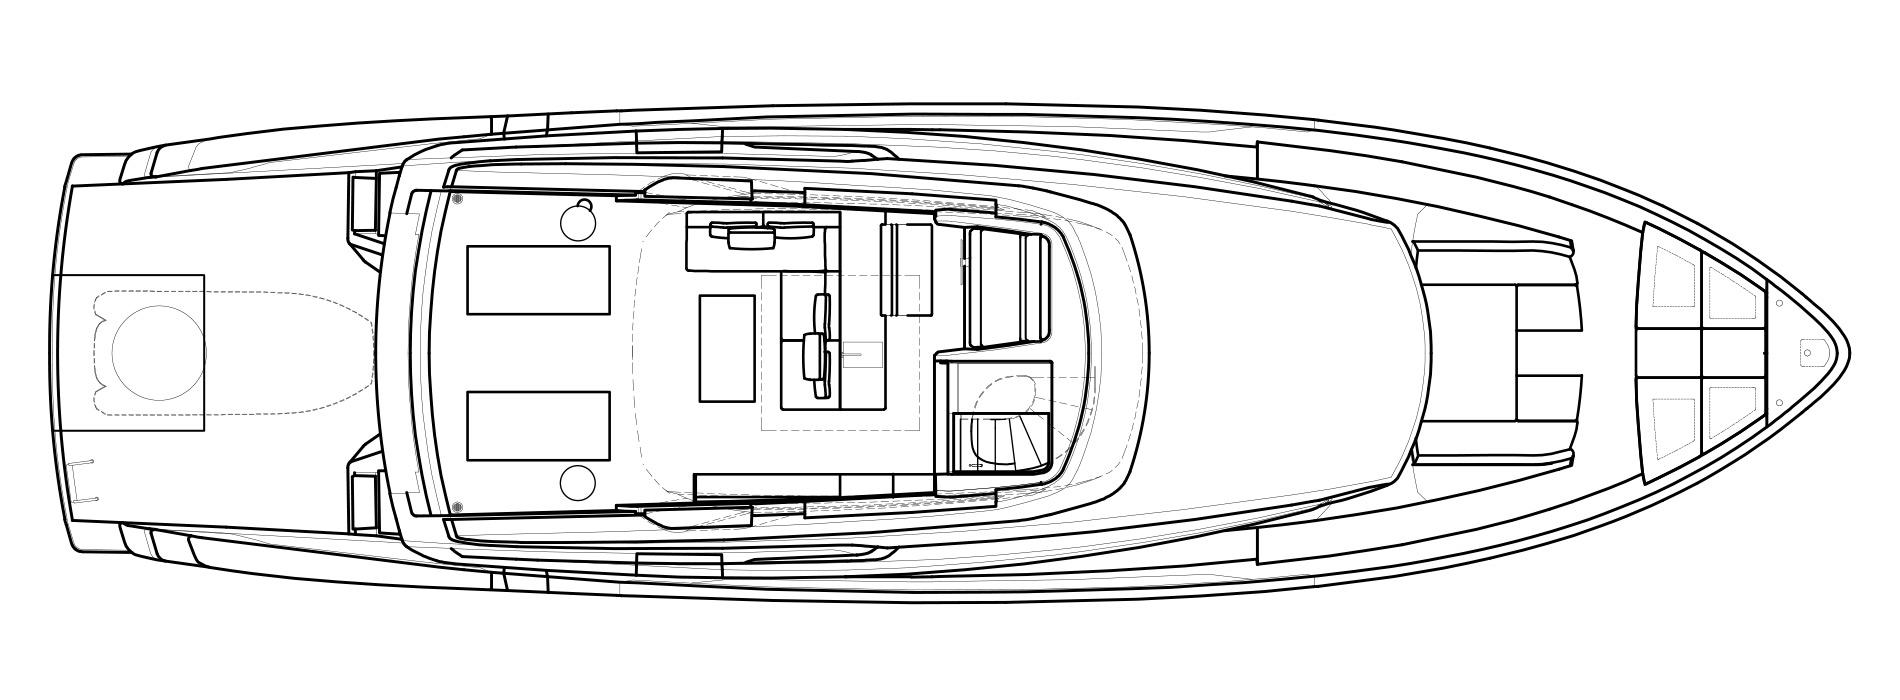 Sanlorenzo Yachts SX76 飞桥 Versione Lissoni